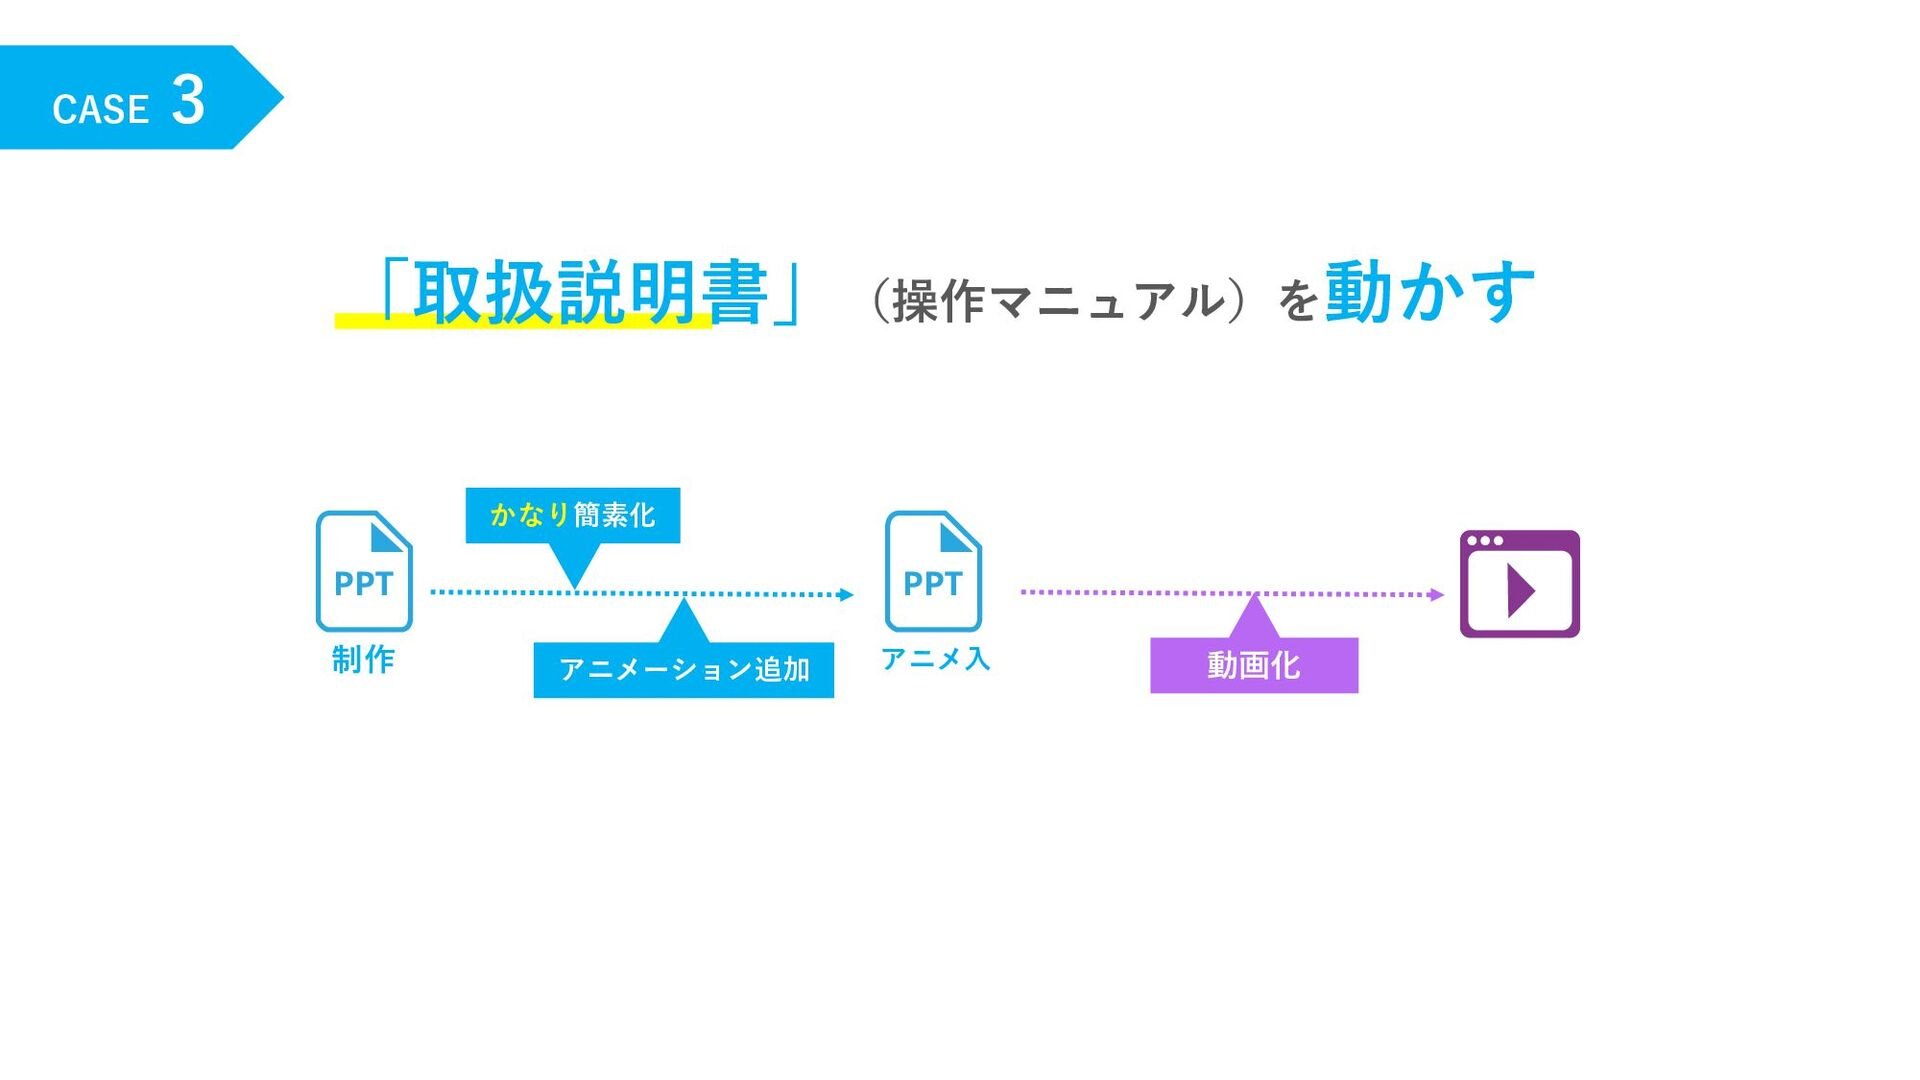 CASE 3 「取扱説明書」(操作マニュアル)を動かす かなり簡素化 制作 動画化 アニメーシ...